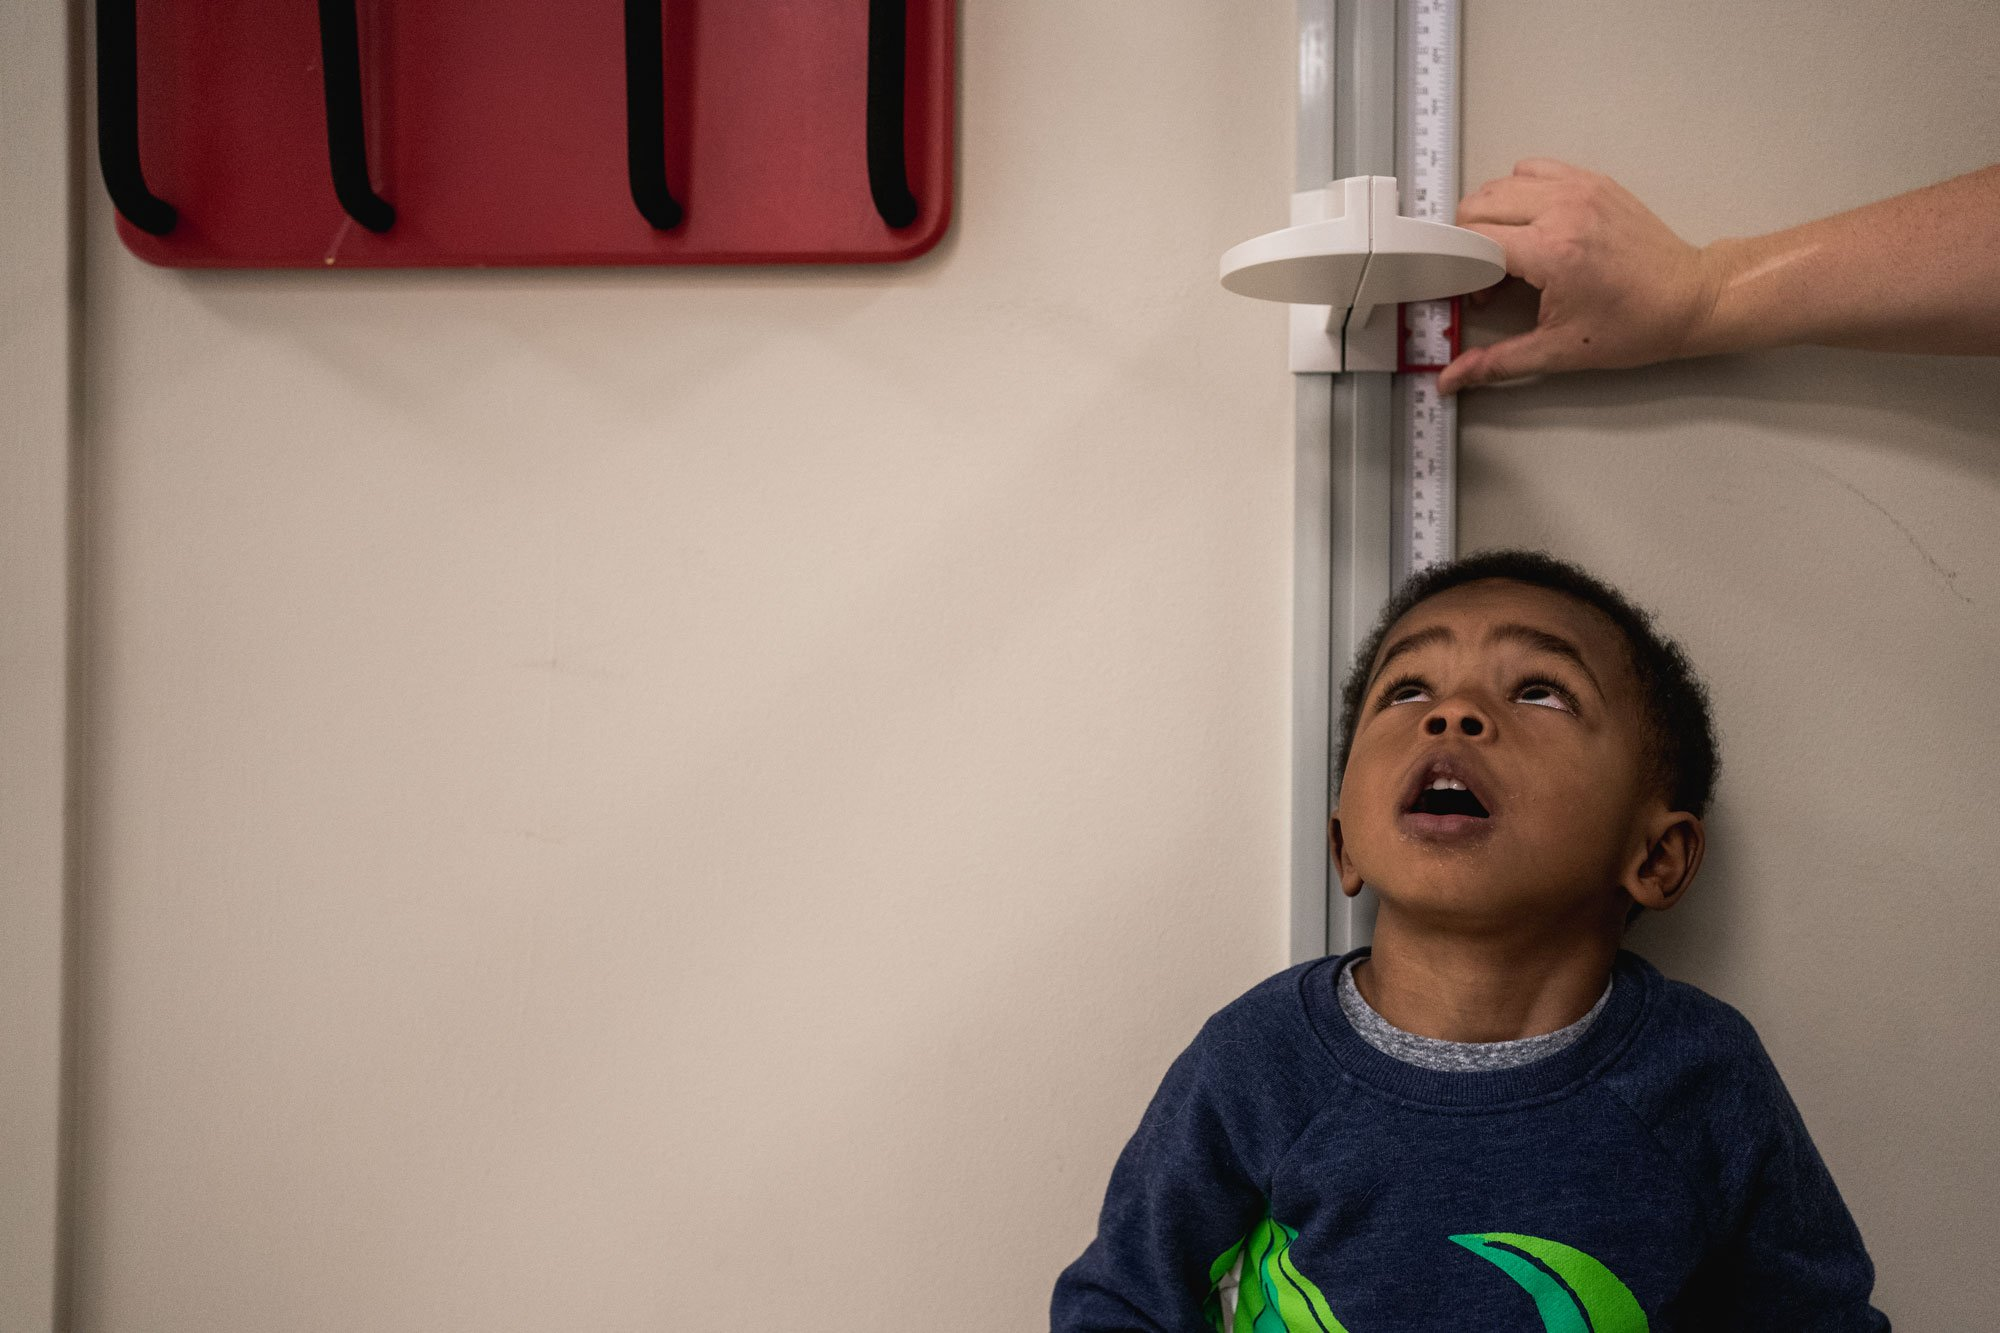 boy watches height measurement